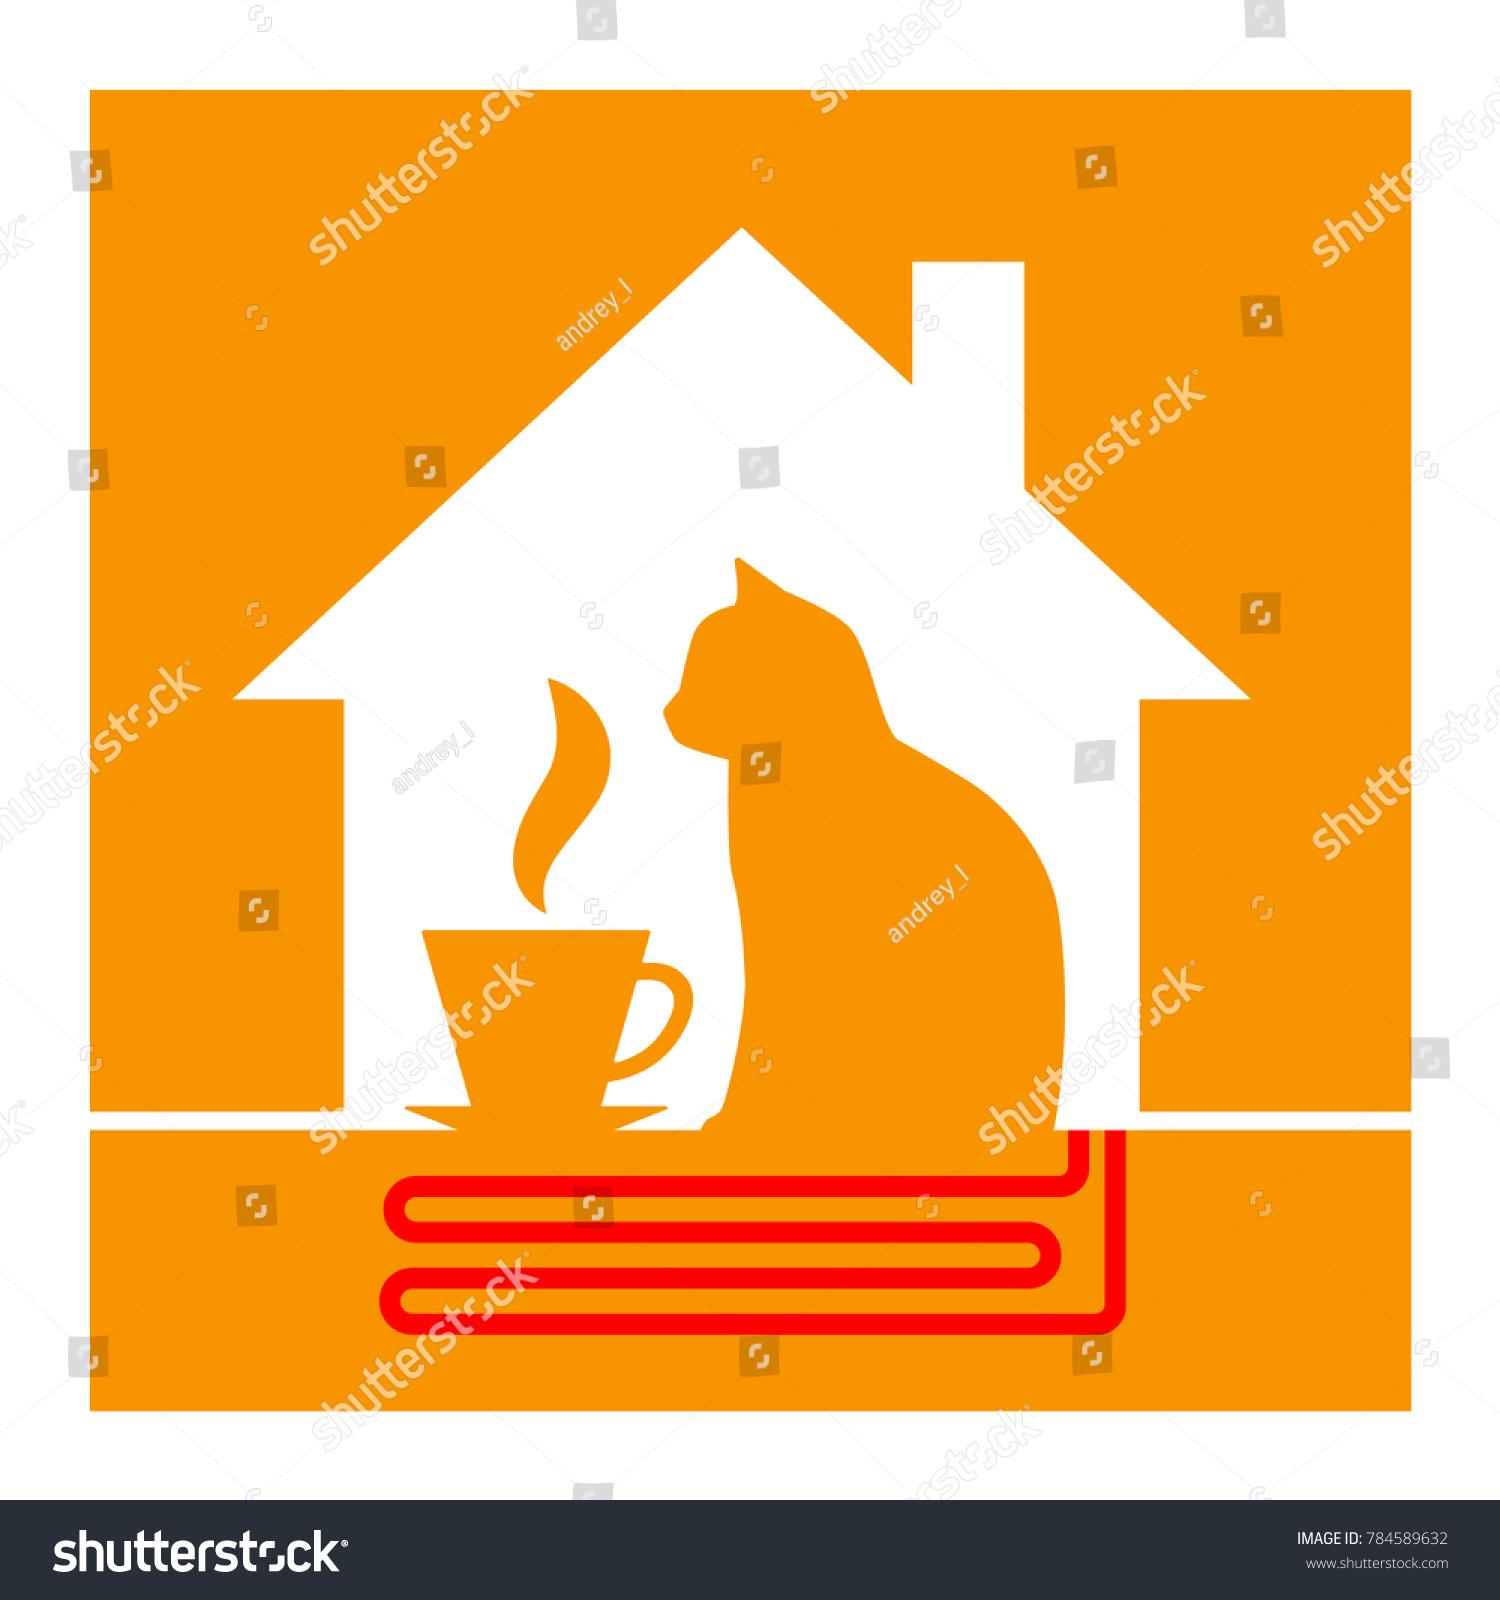 Warm Gradient Line Drawing Of A Cartoon House Lizenzfrei Nutzbare  Vektorgrafiken, Clip Arts, Illustrationen. Image 130511419.